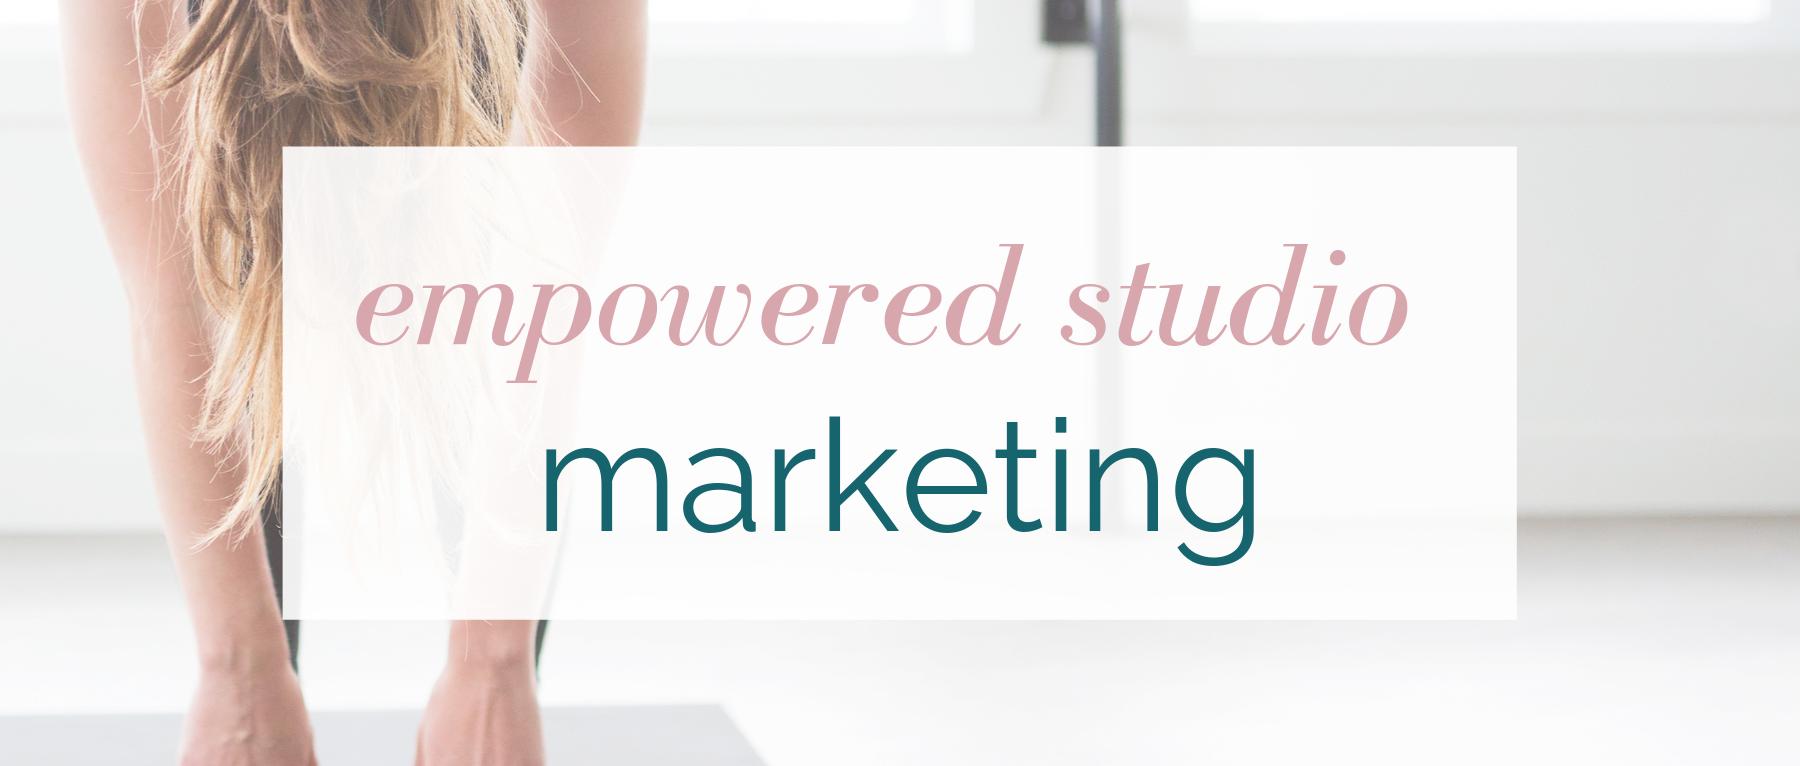 Empowered Studio Marketing